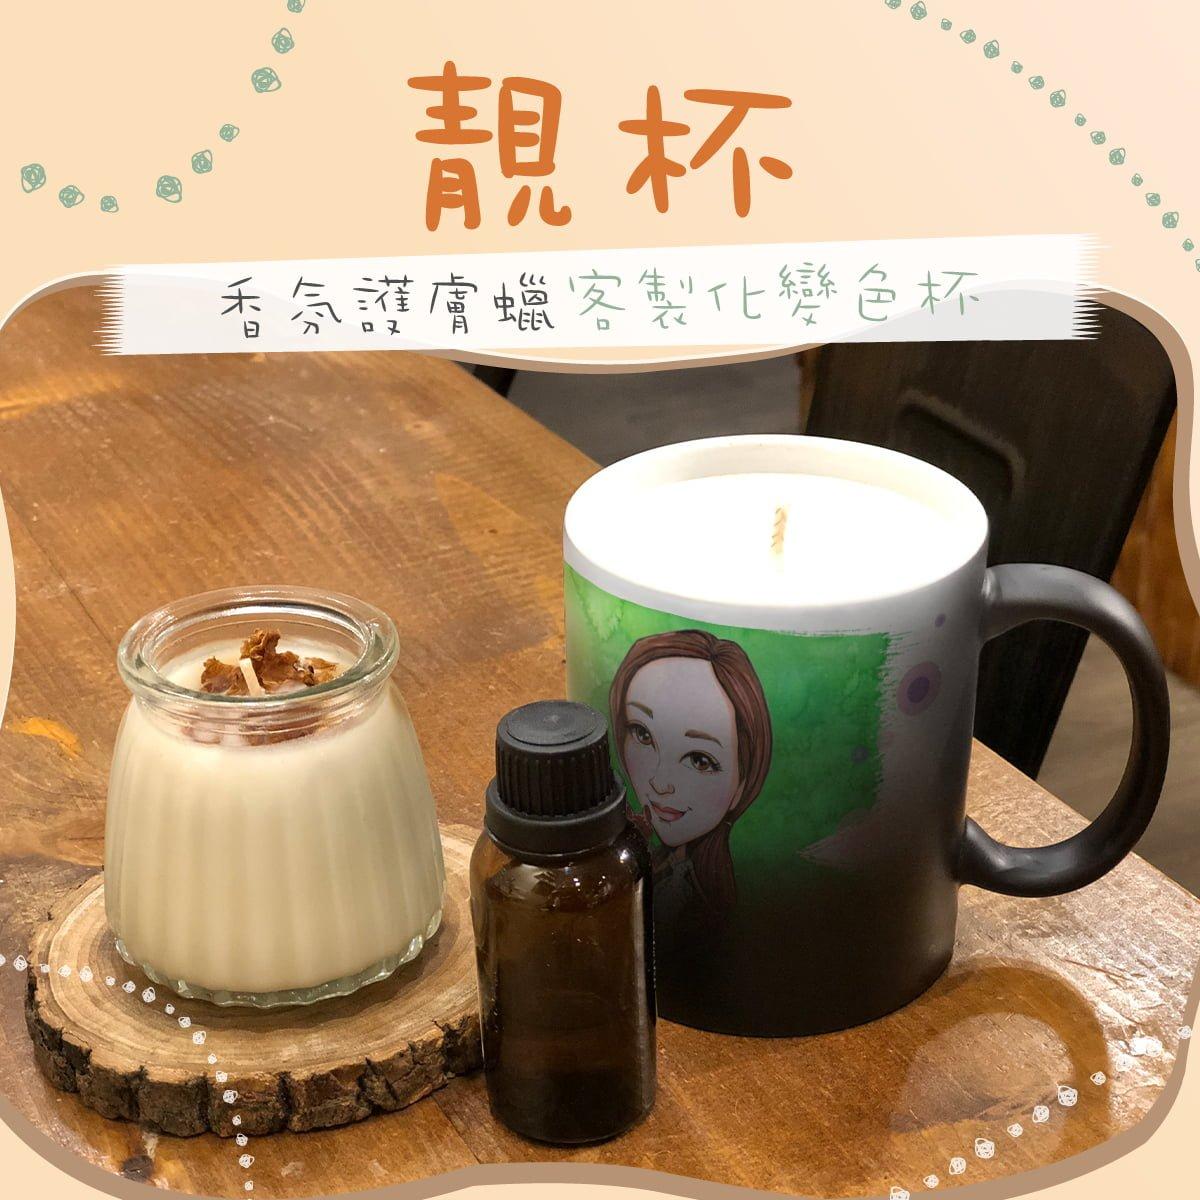 1090128B 靚杯 – 香氛護膚蠟客製化變色杯